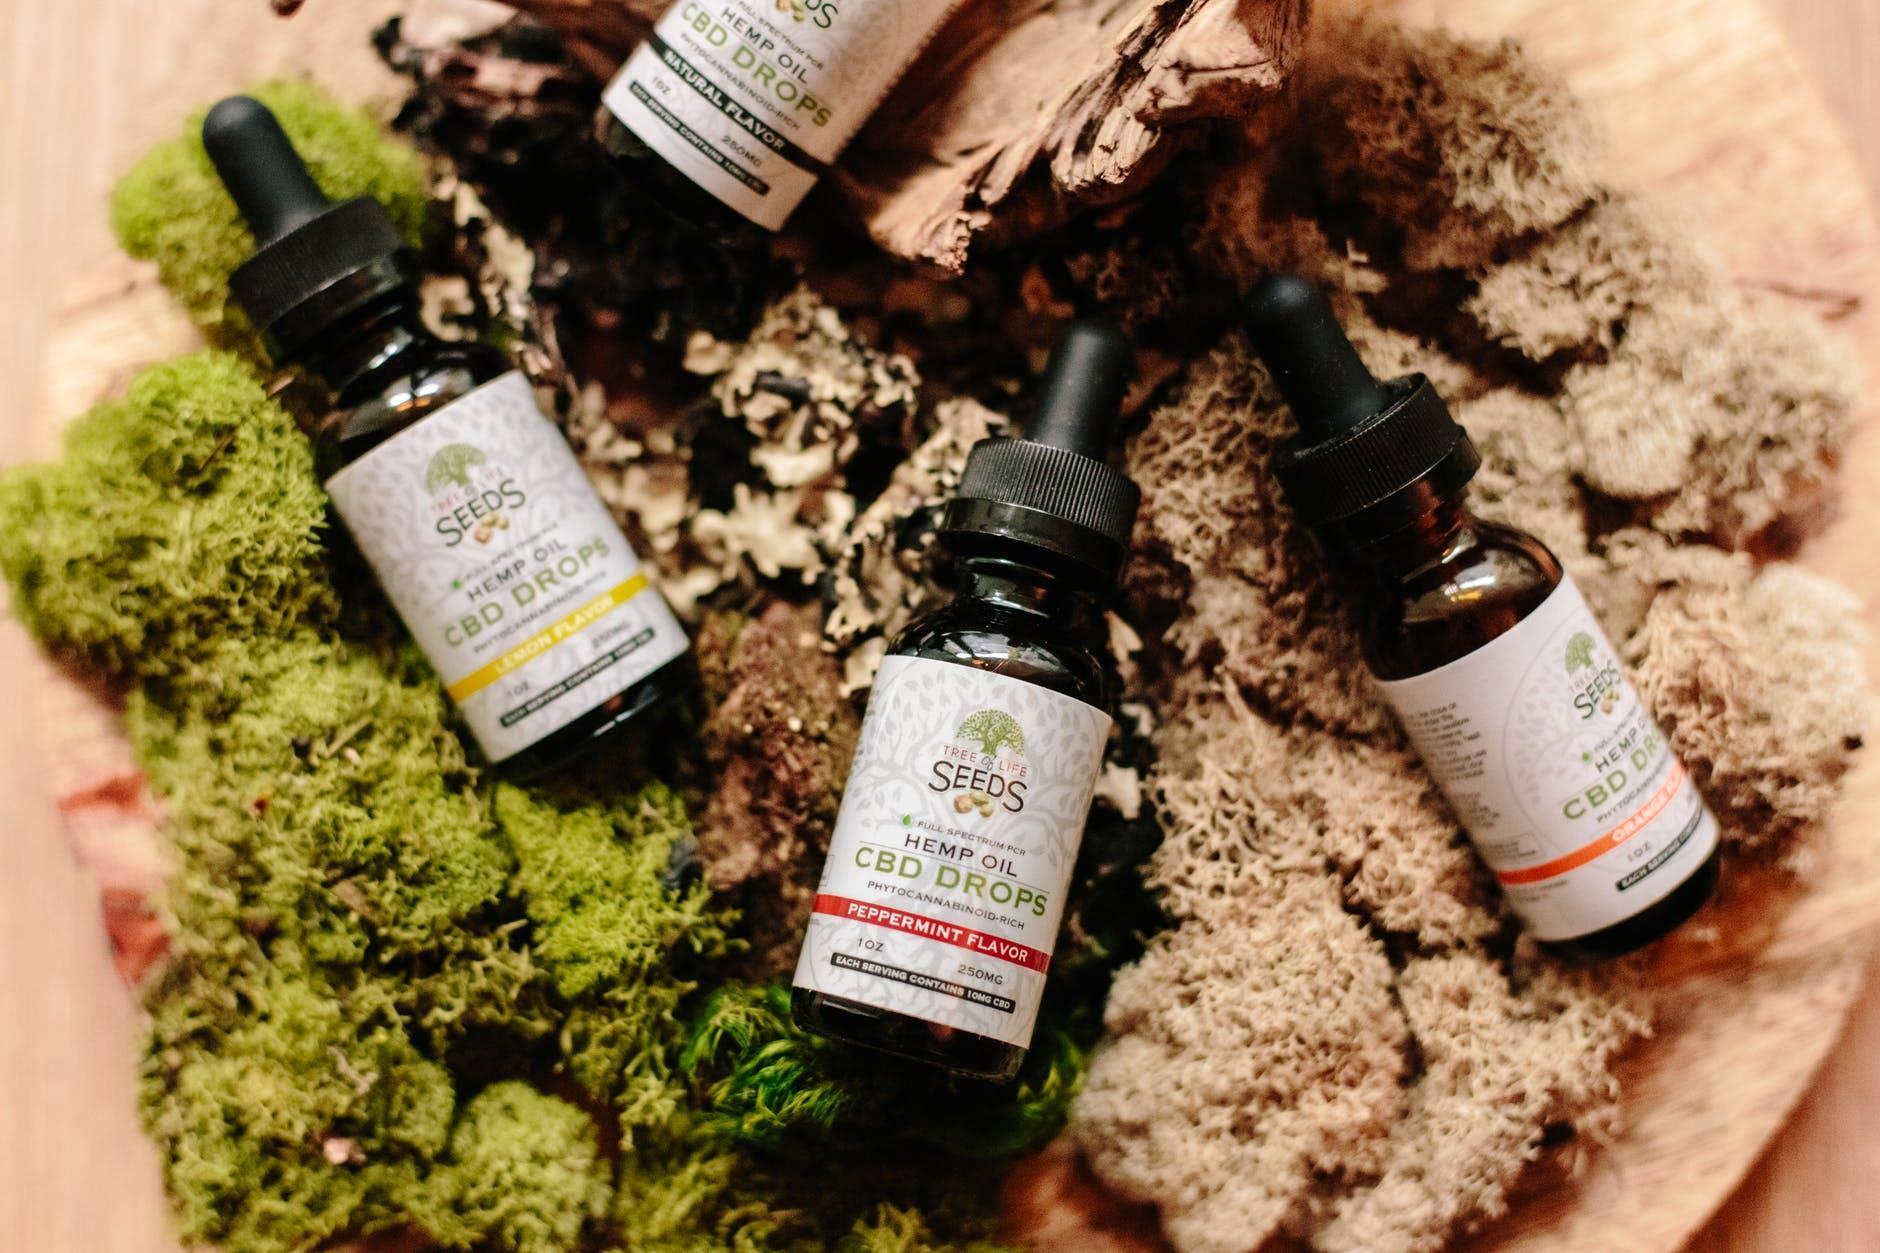 CBD Oil and Medical Cannabis Comparison